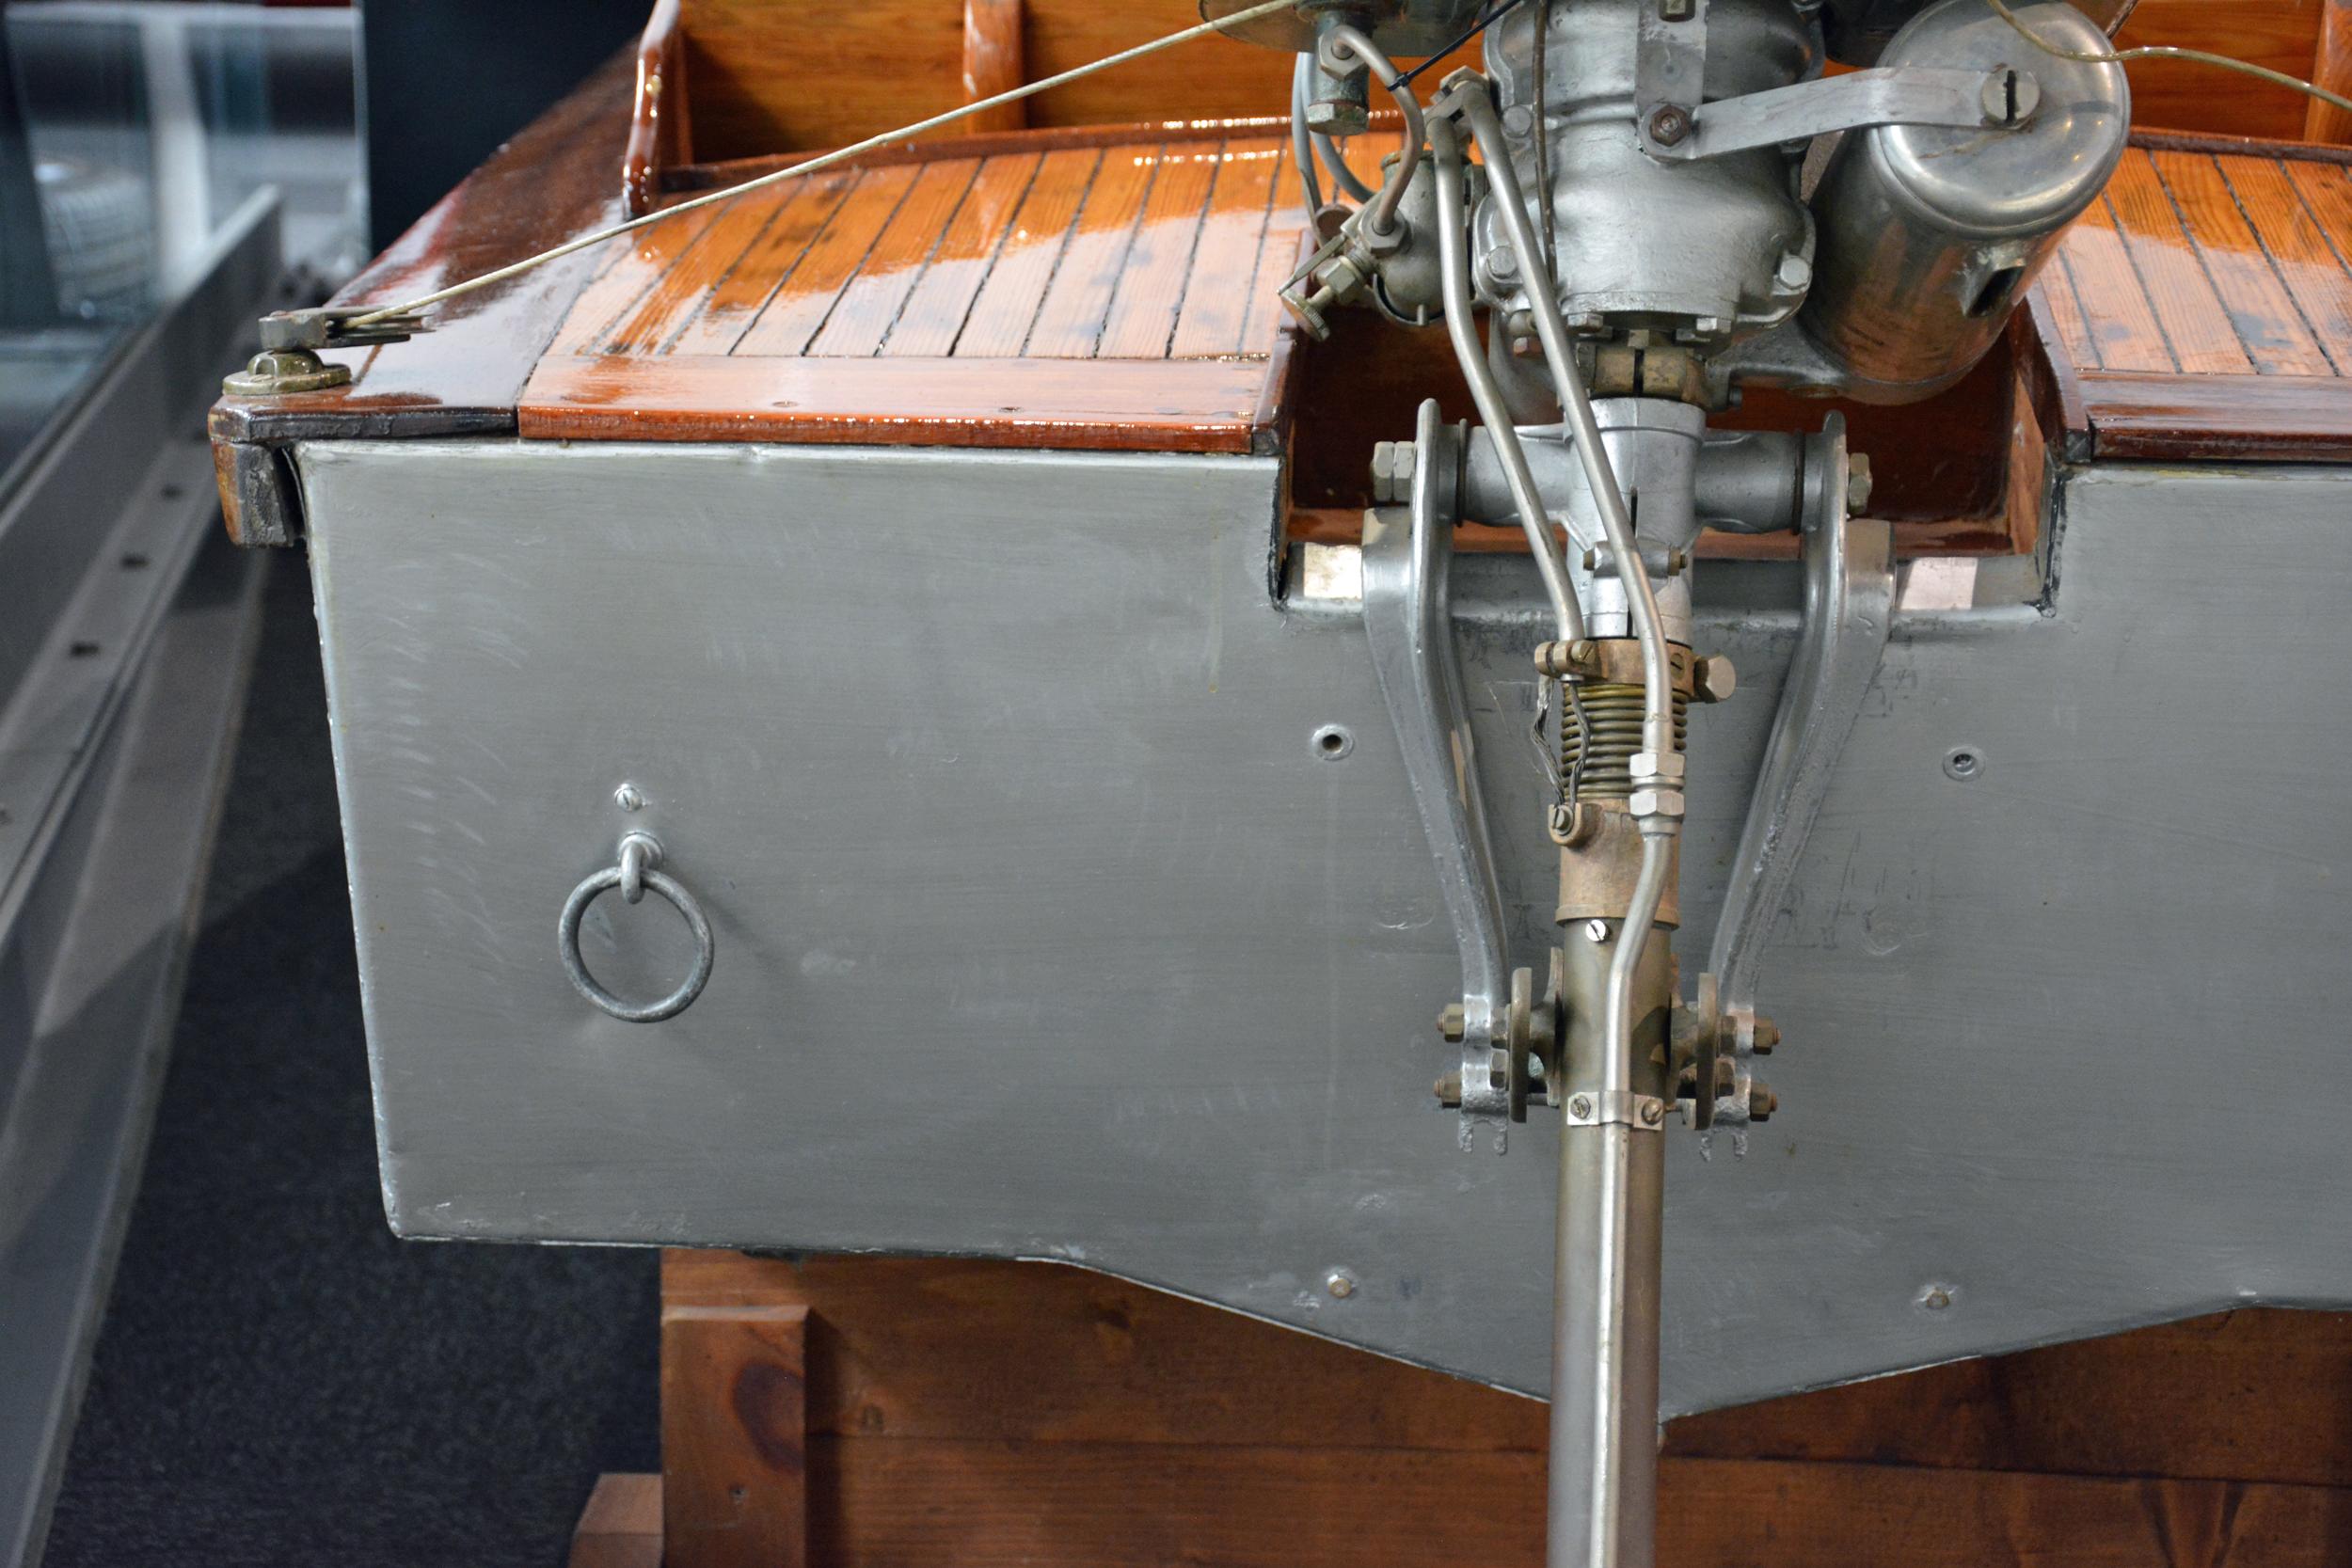 saab museum boat rear engine